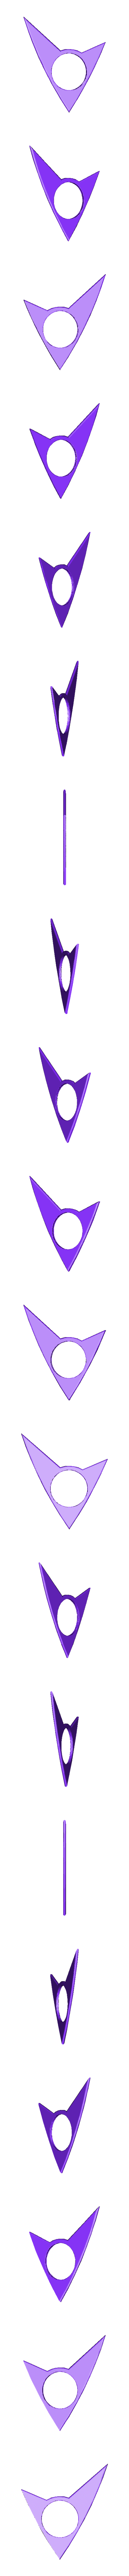 FISHTAIL-GRANIOM 180819-6.stl Download free STL file FISHTAIL GRANIOM (ELECTRIC GUITAR PICK) • 3D printing template, carleslluisar